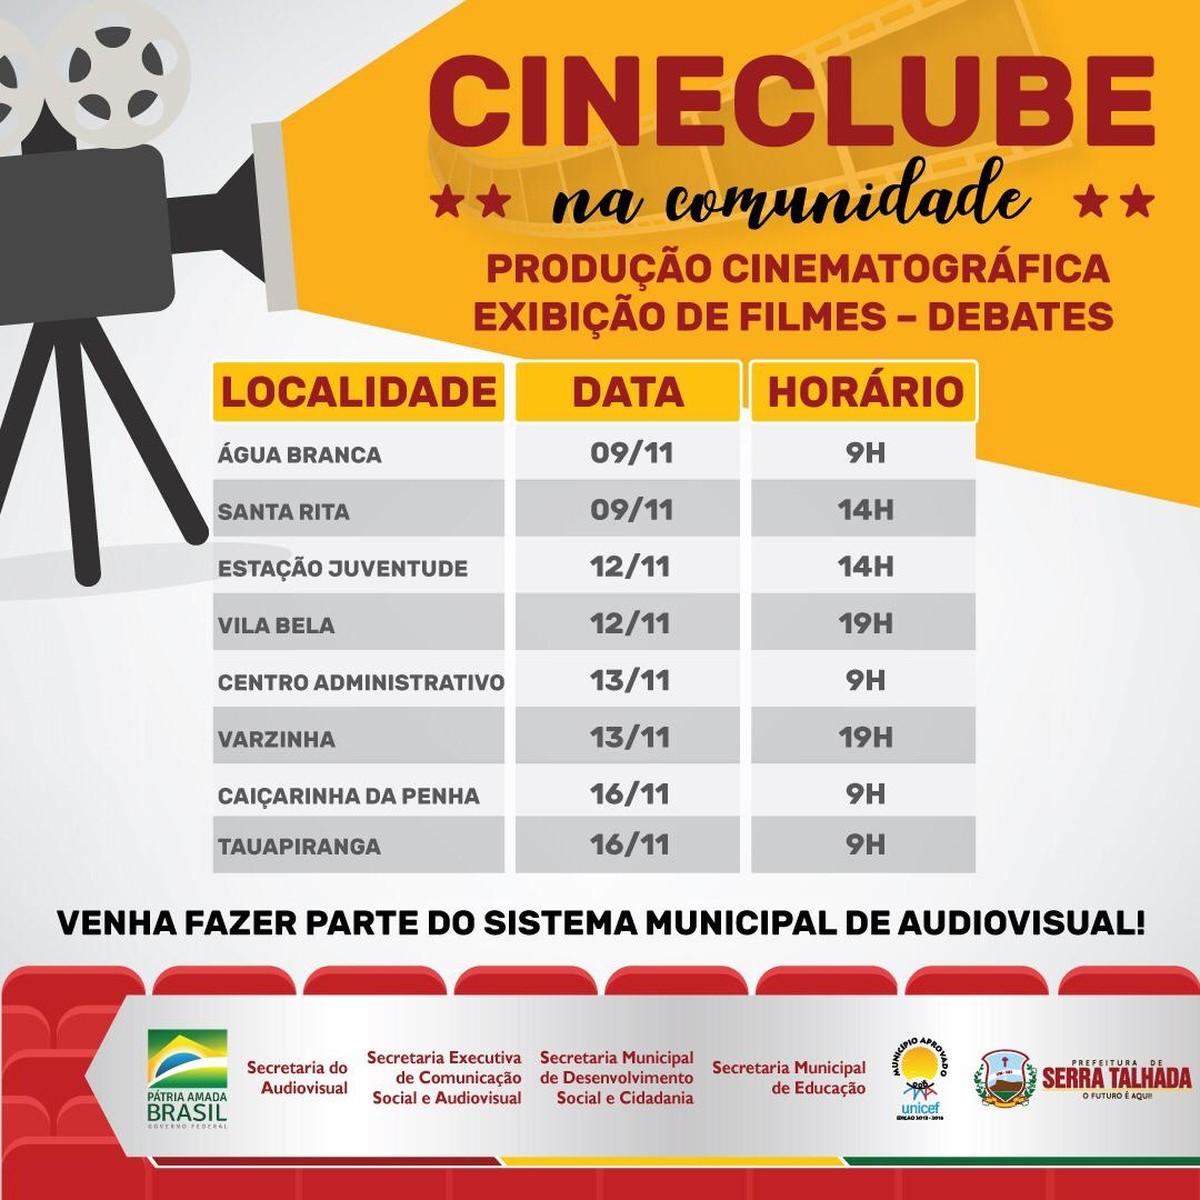 Prefeitura de Serra Talhada promove projeto 'Cineclube na Comunidade' - G1